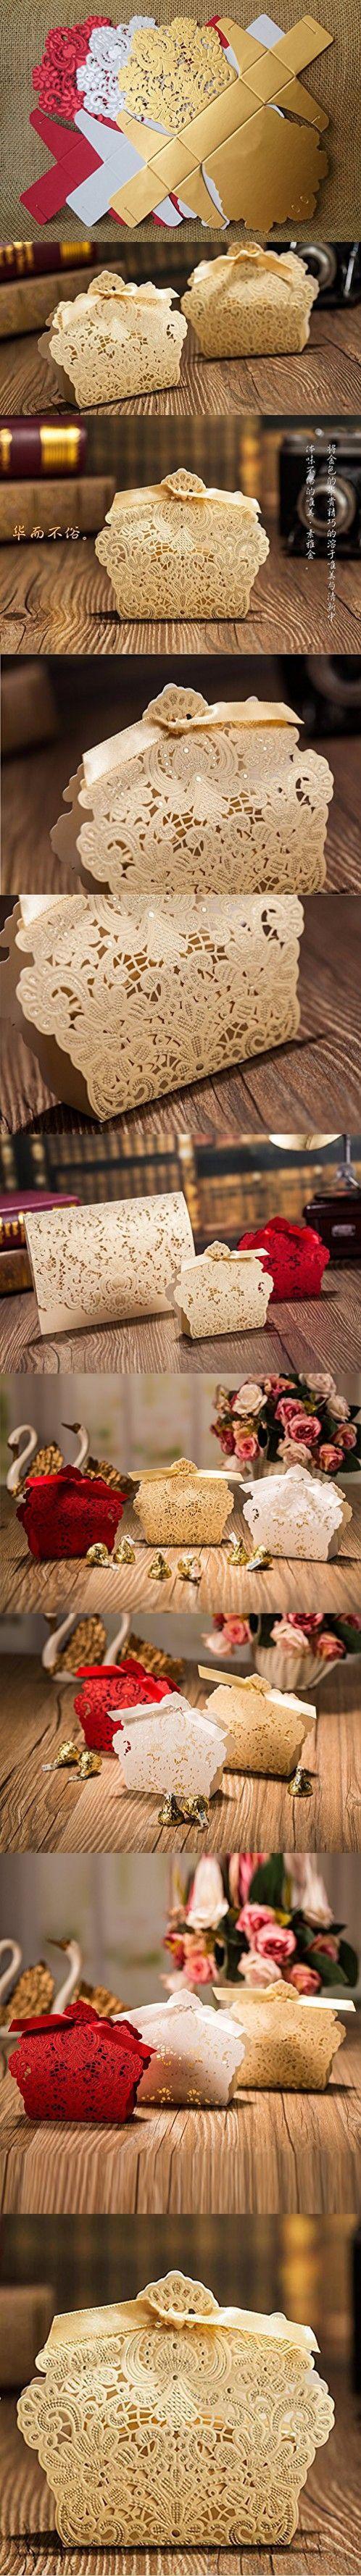 Coffee mug wedding favors - Best 25 Wedding Favor Sayings Ideas Only On Pinterest Popcorn Wedding Favors Wedding Reception Party Favors And Wedding Favors Cheap